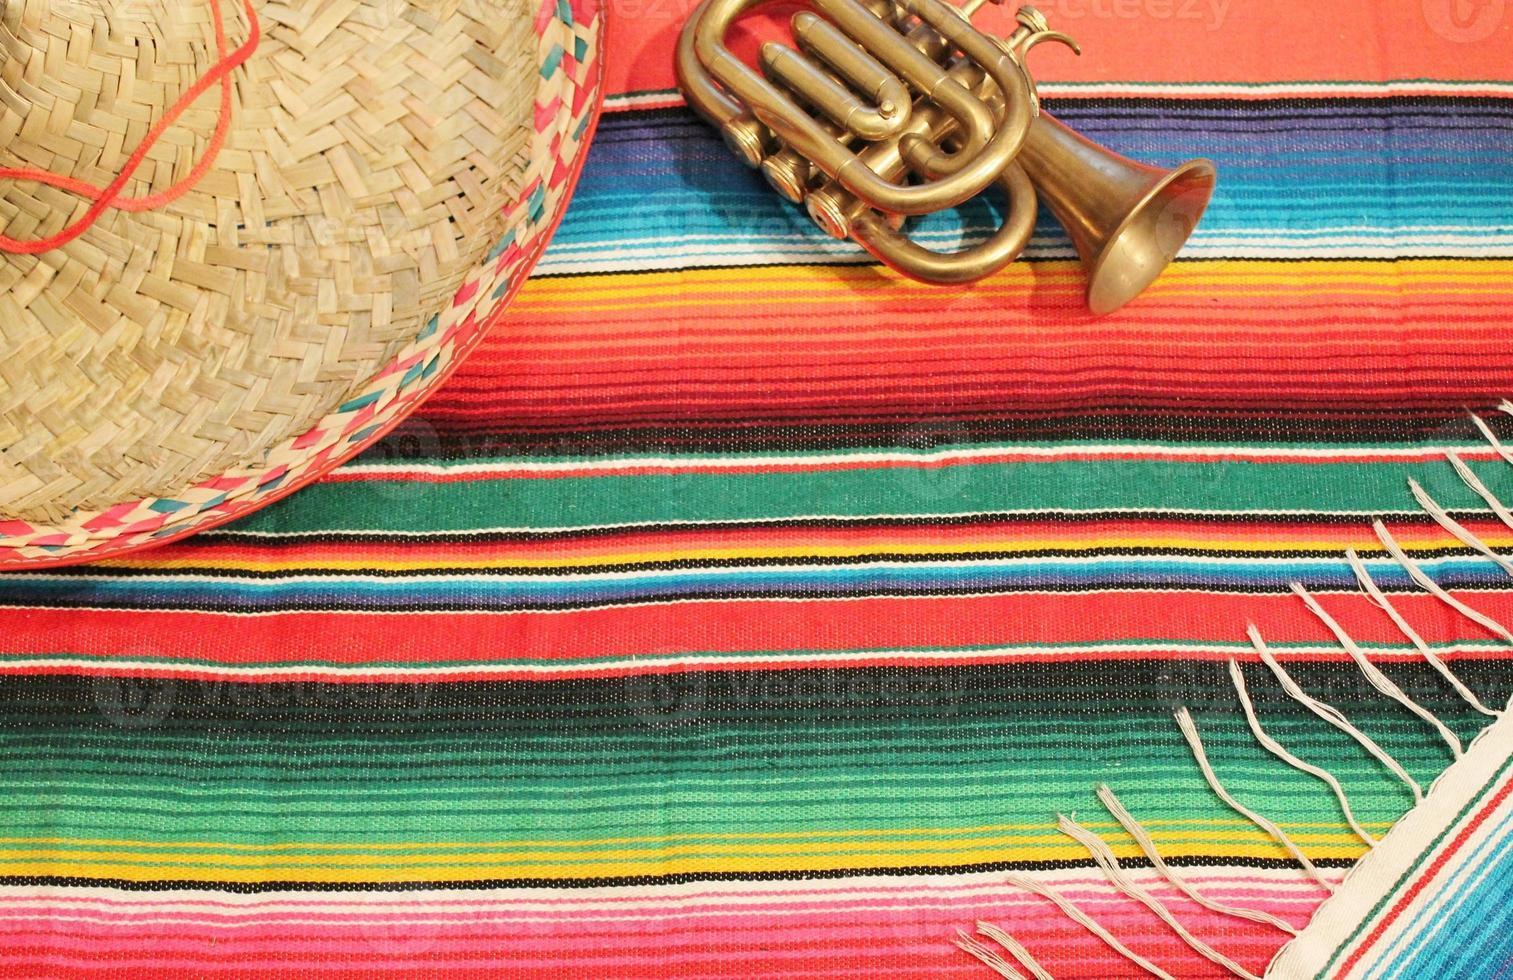 mexikansk fiesta poncho matta sombrero trumpet kopia utrymme foto